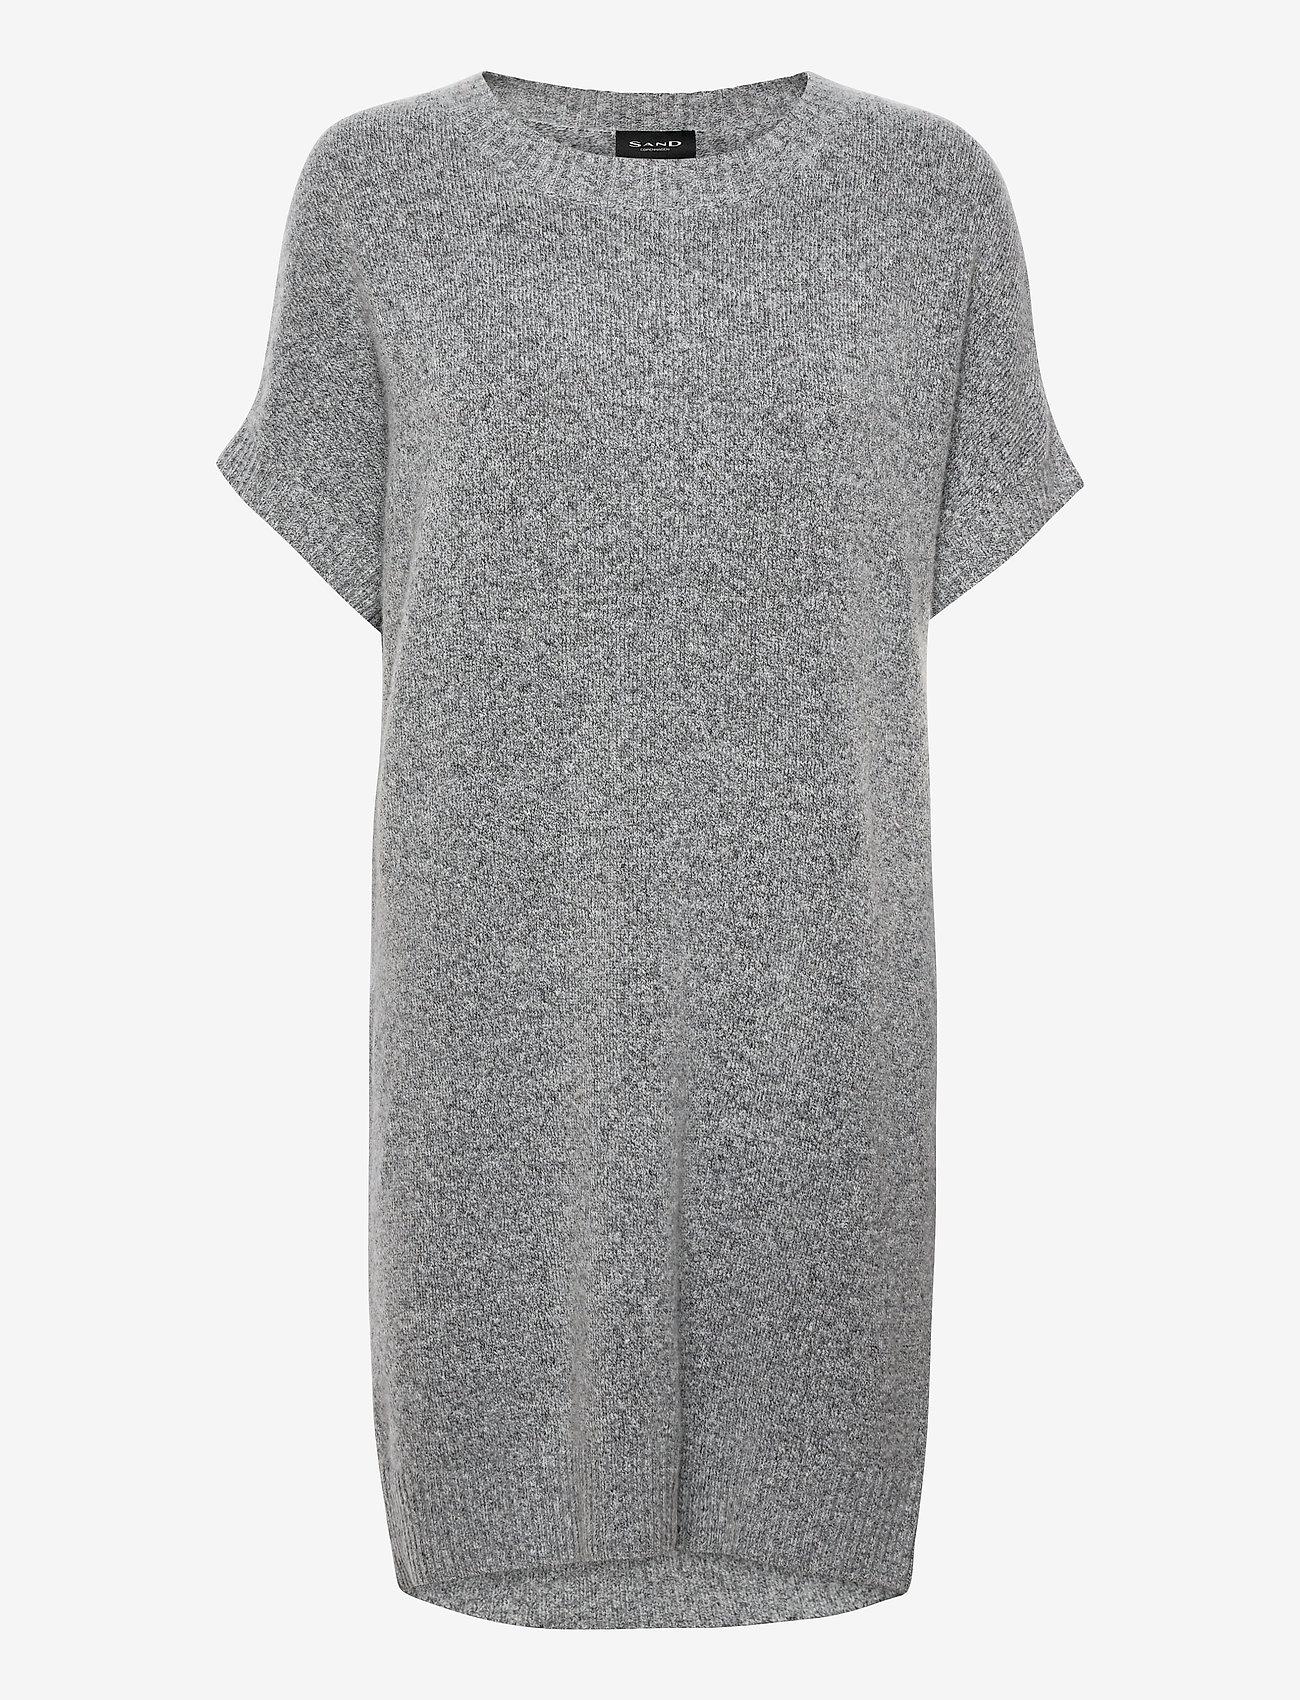 SAND - 5210 - Izadi Dress - robes de jour - grey - 0